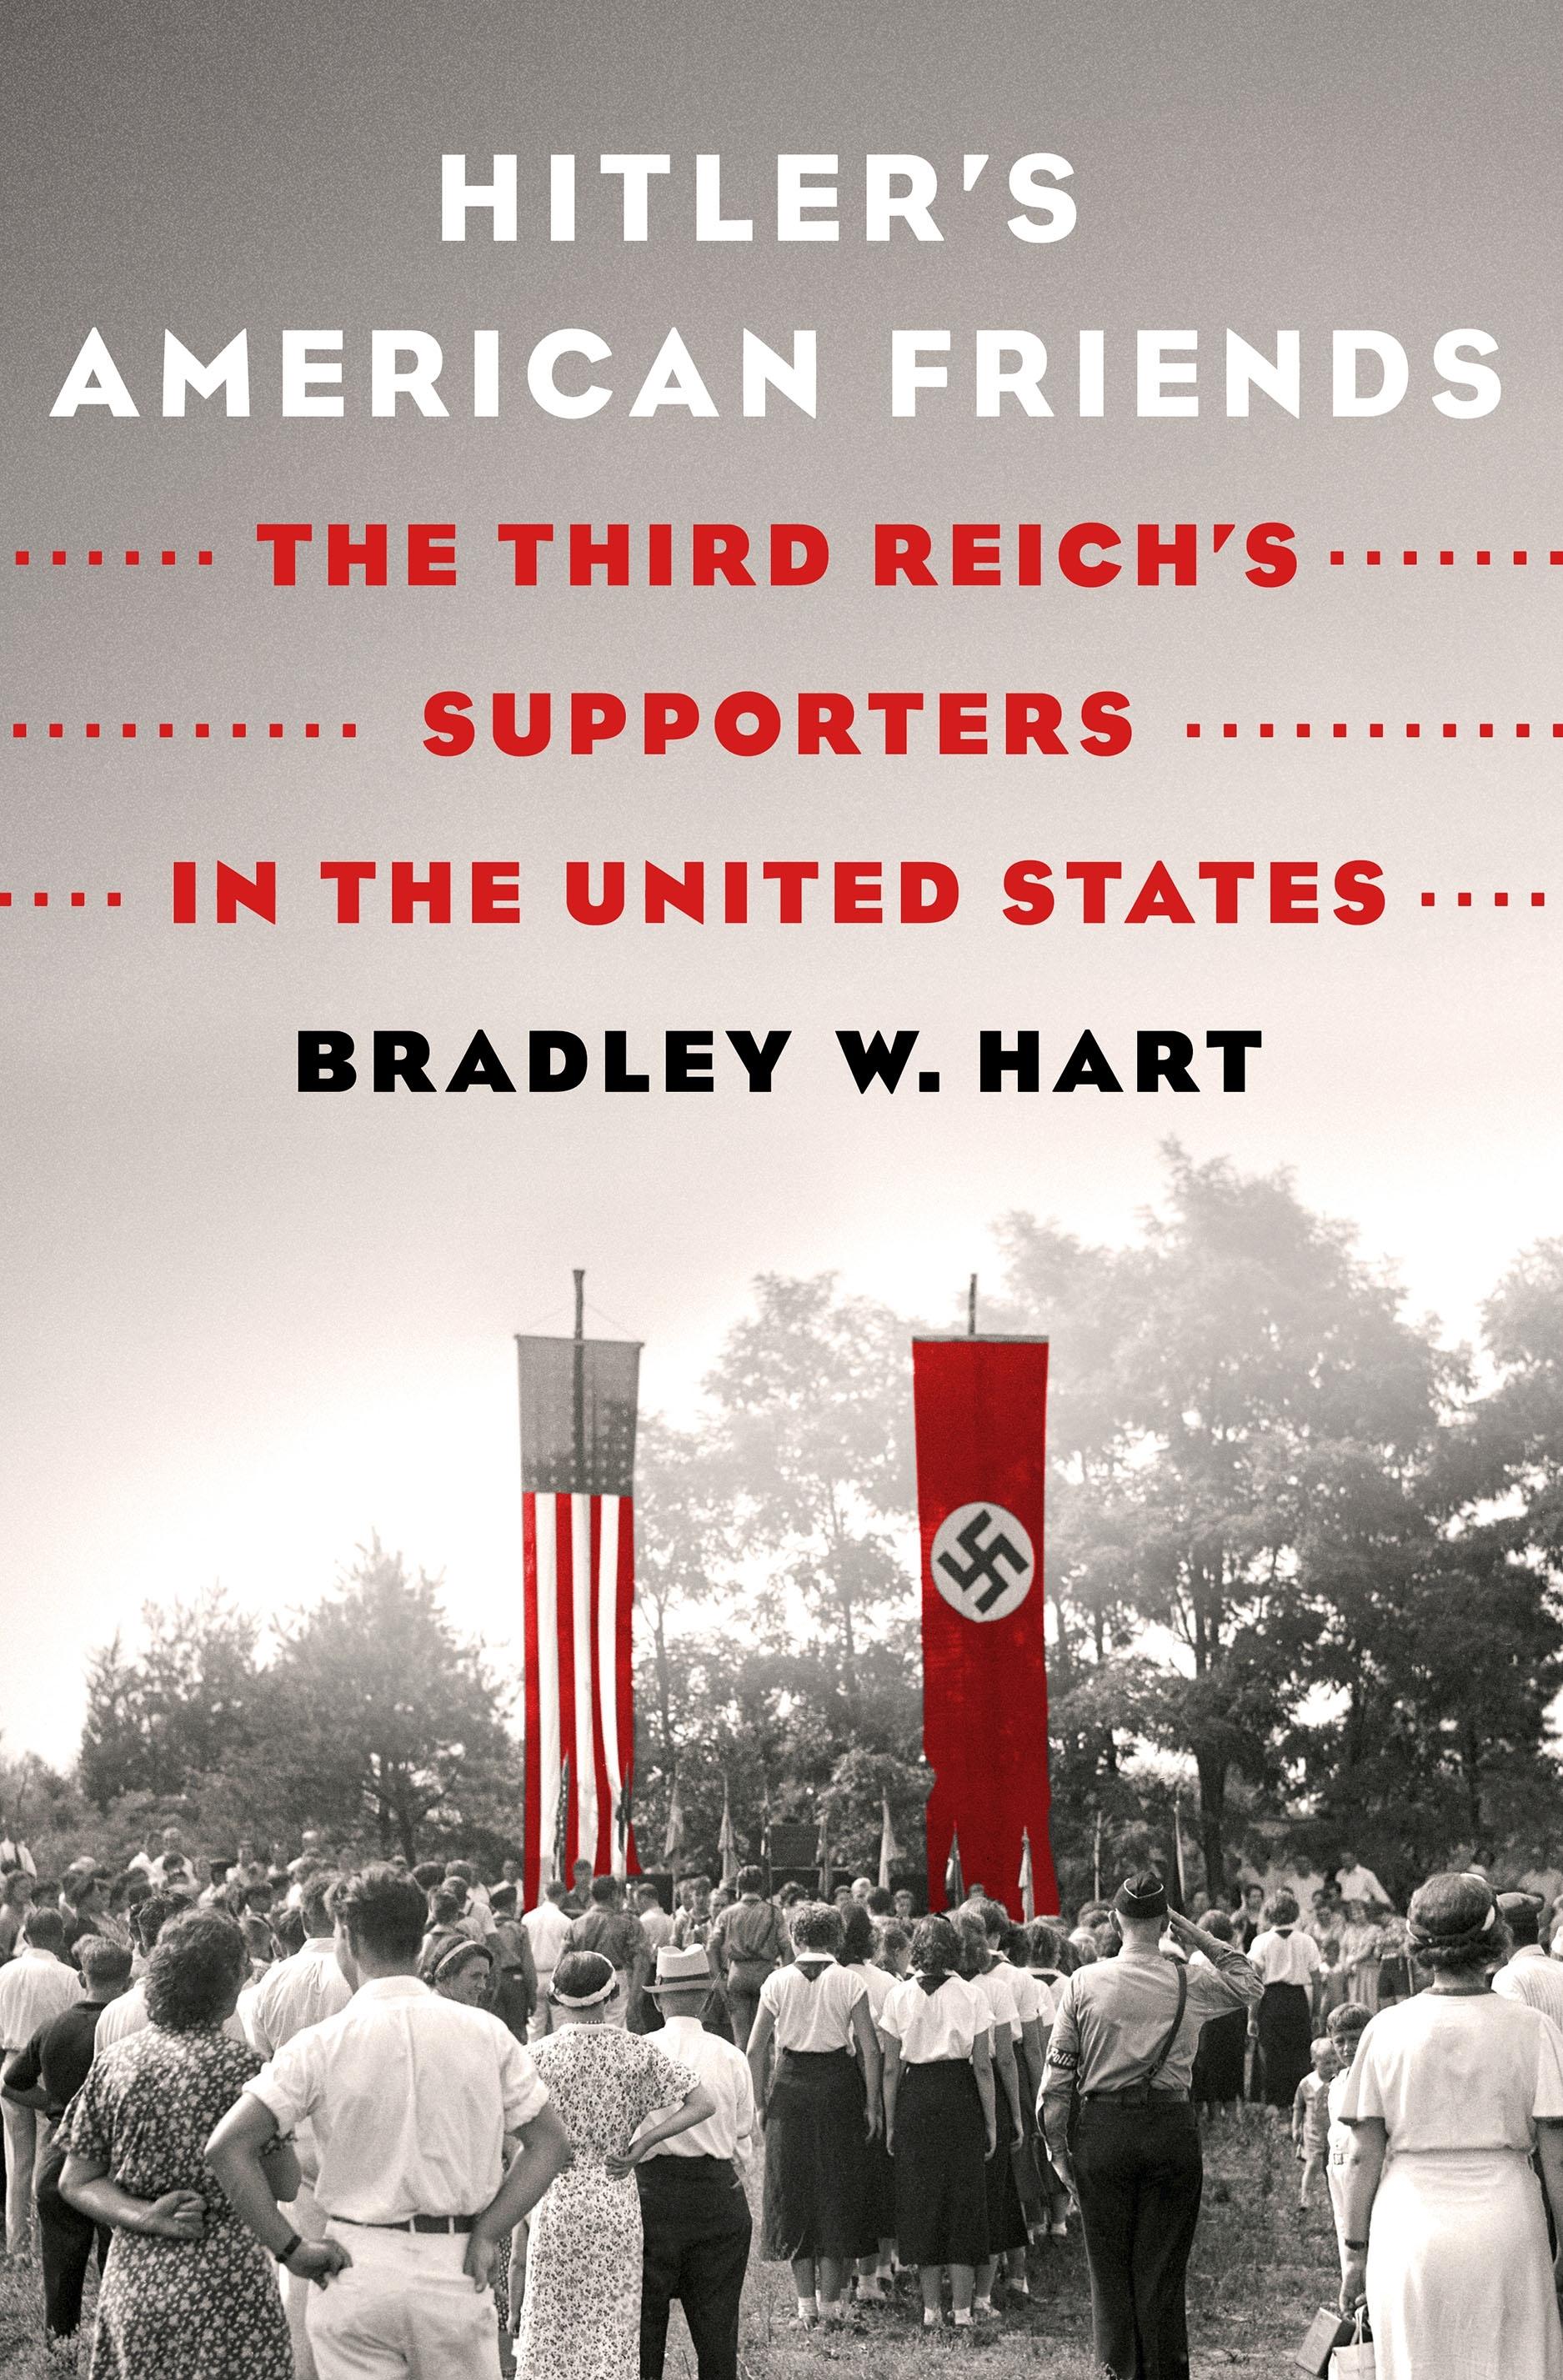 Hitler's American Friends cover, hi-res.jpg